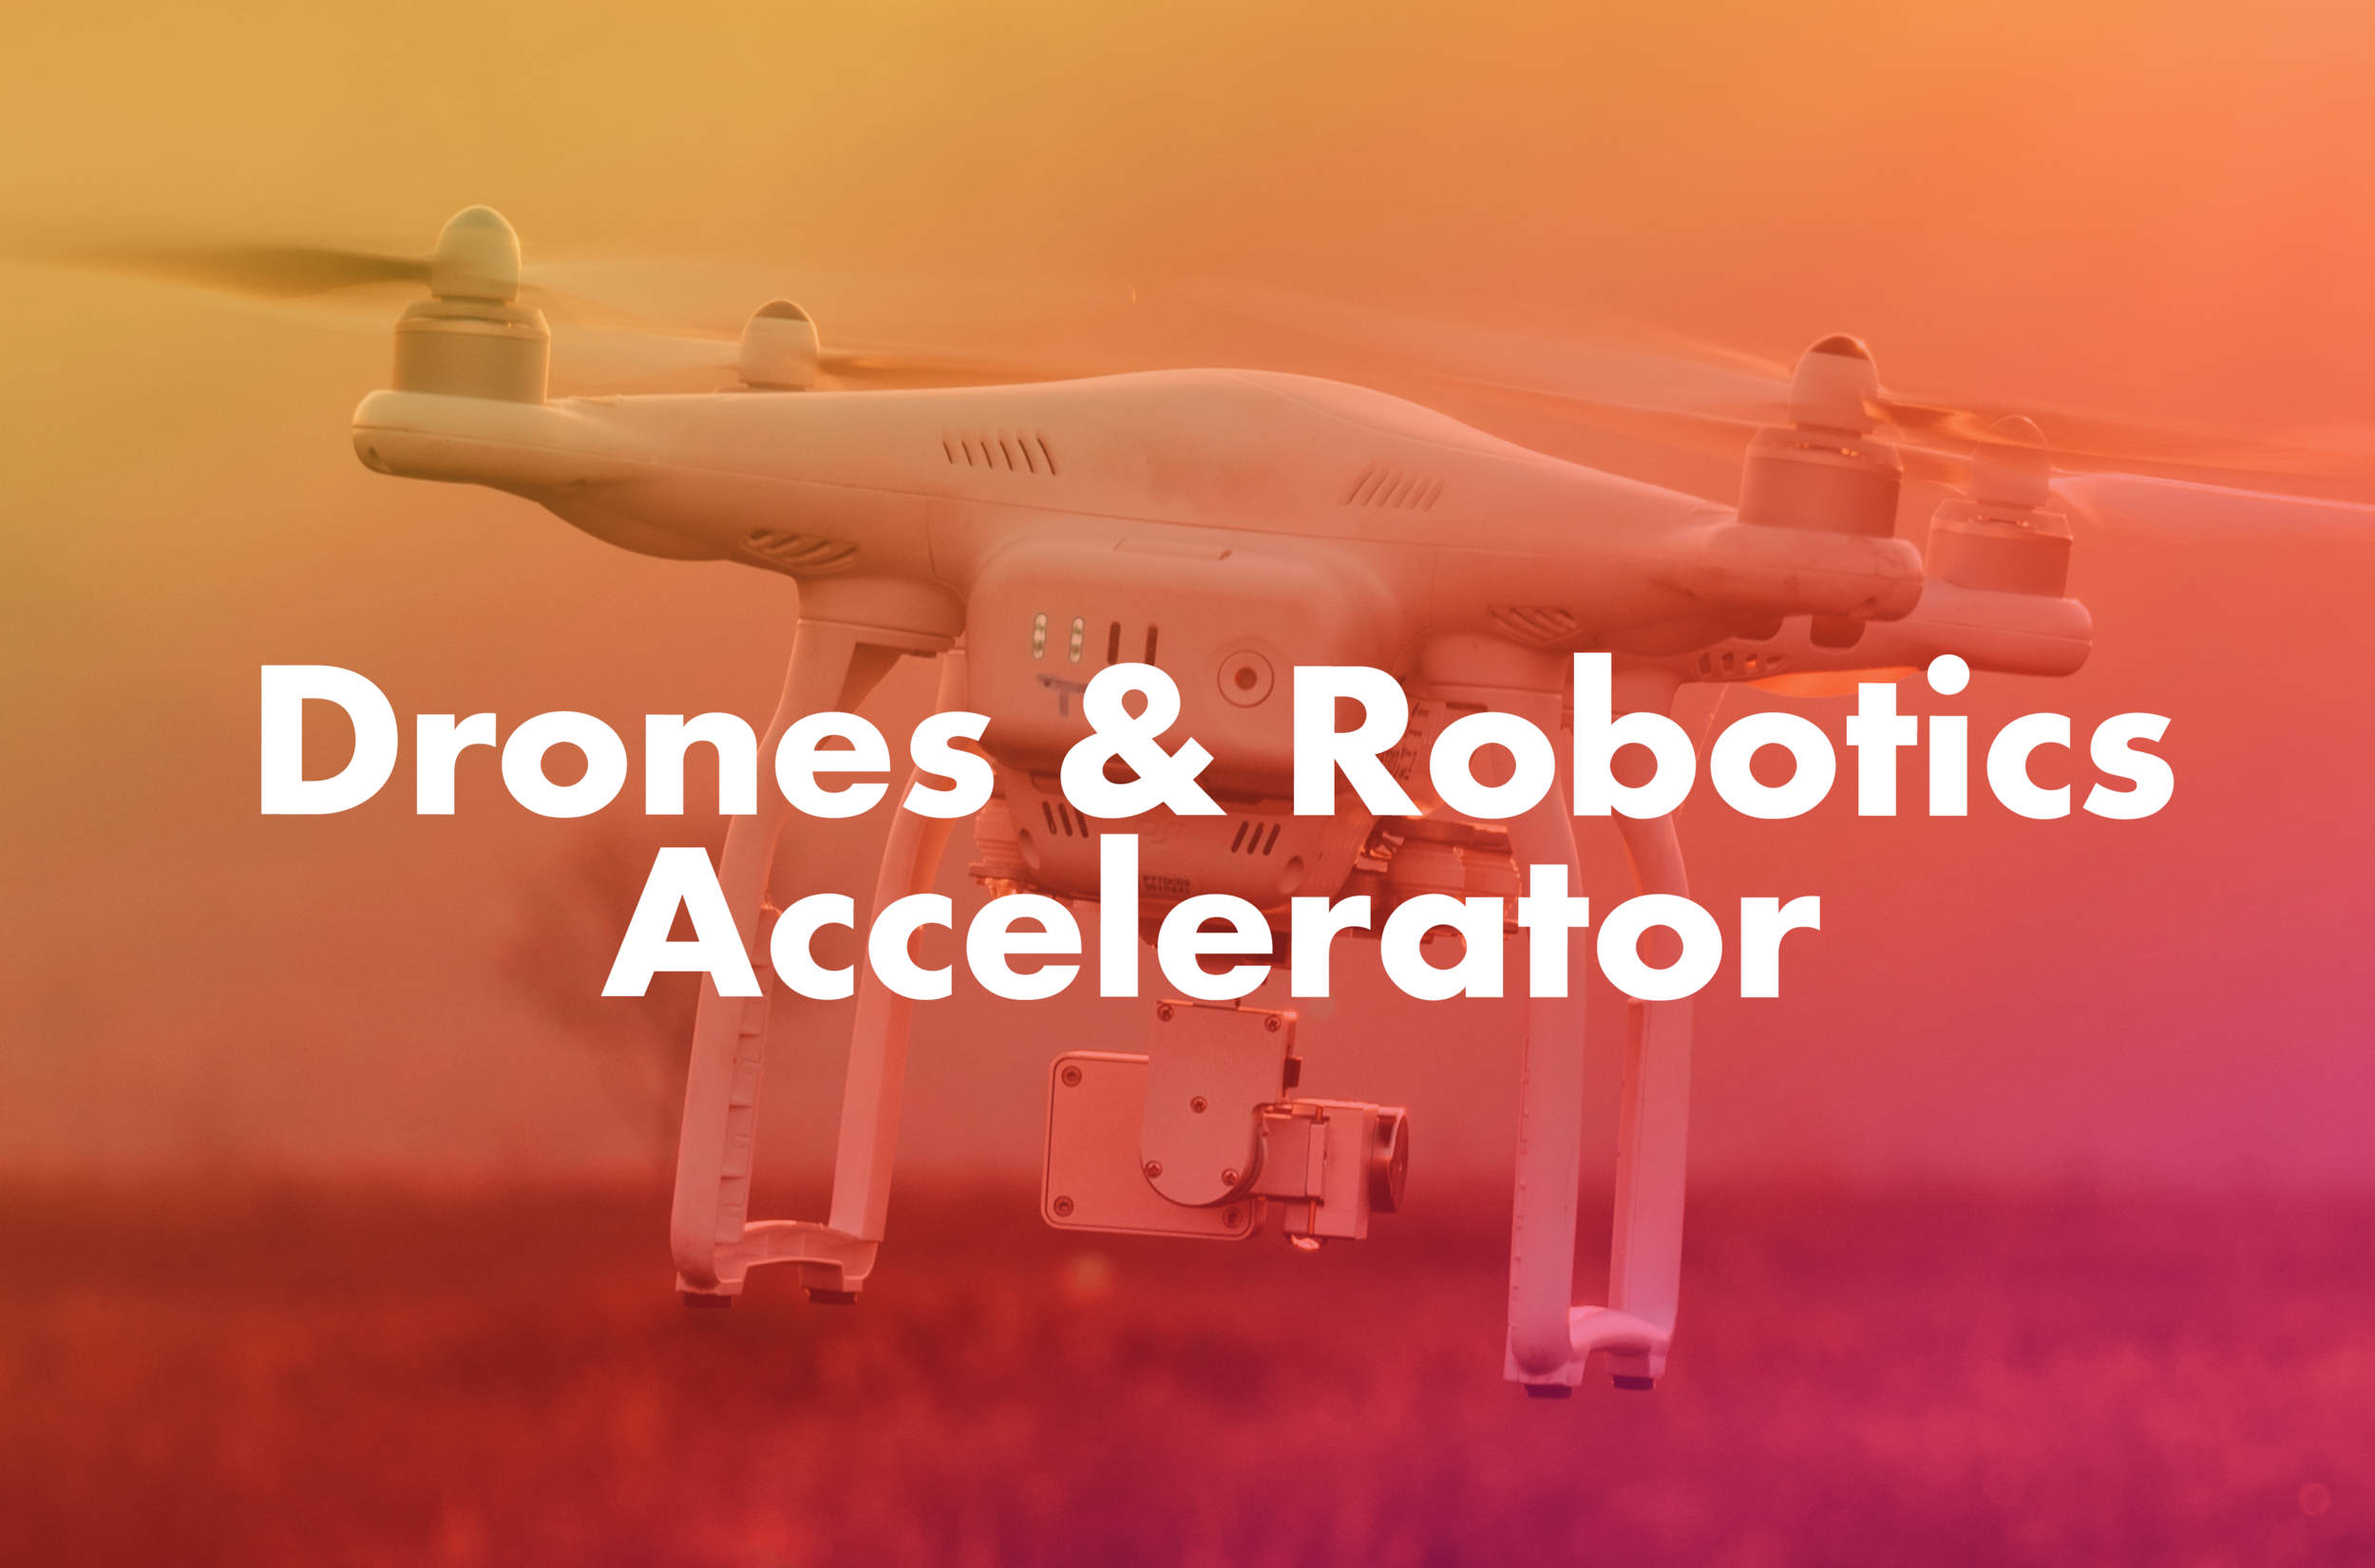 drones accelerator banner.png